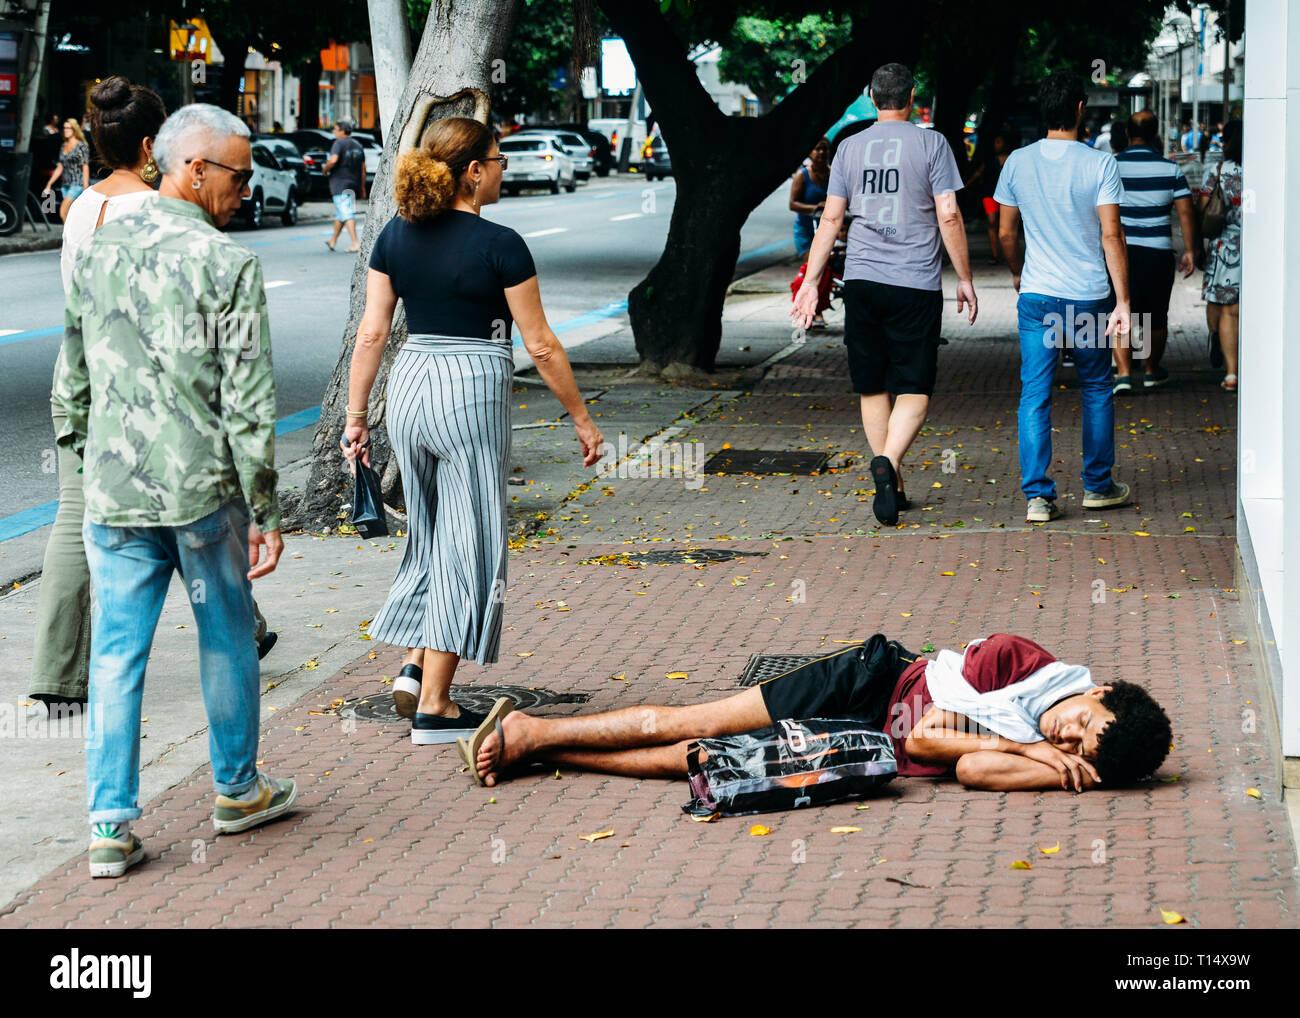 Rio de Janeiro, Brazil, March 23, 2019: Homeless young man sleeping rough while pedestrians walk next to him on busy pedestrian sidewalk in the wealth Stock Photo